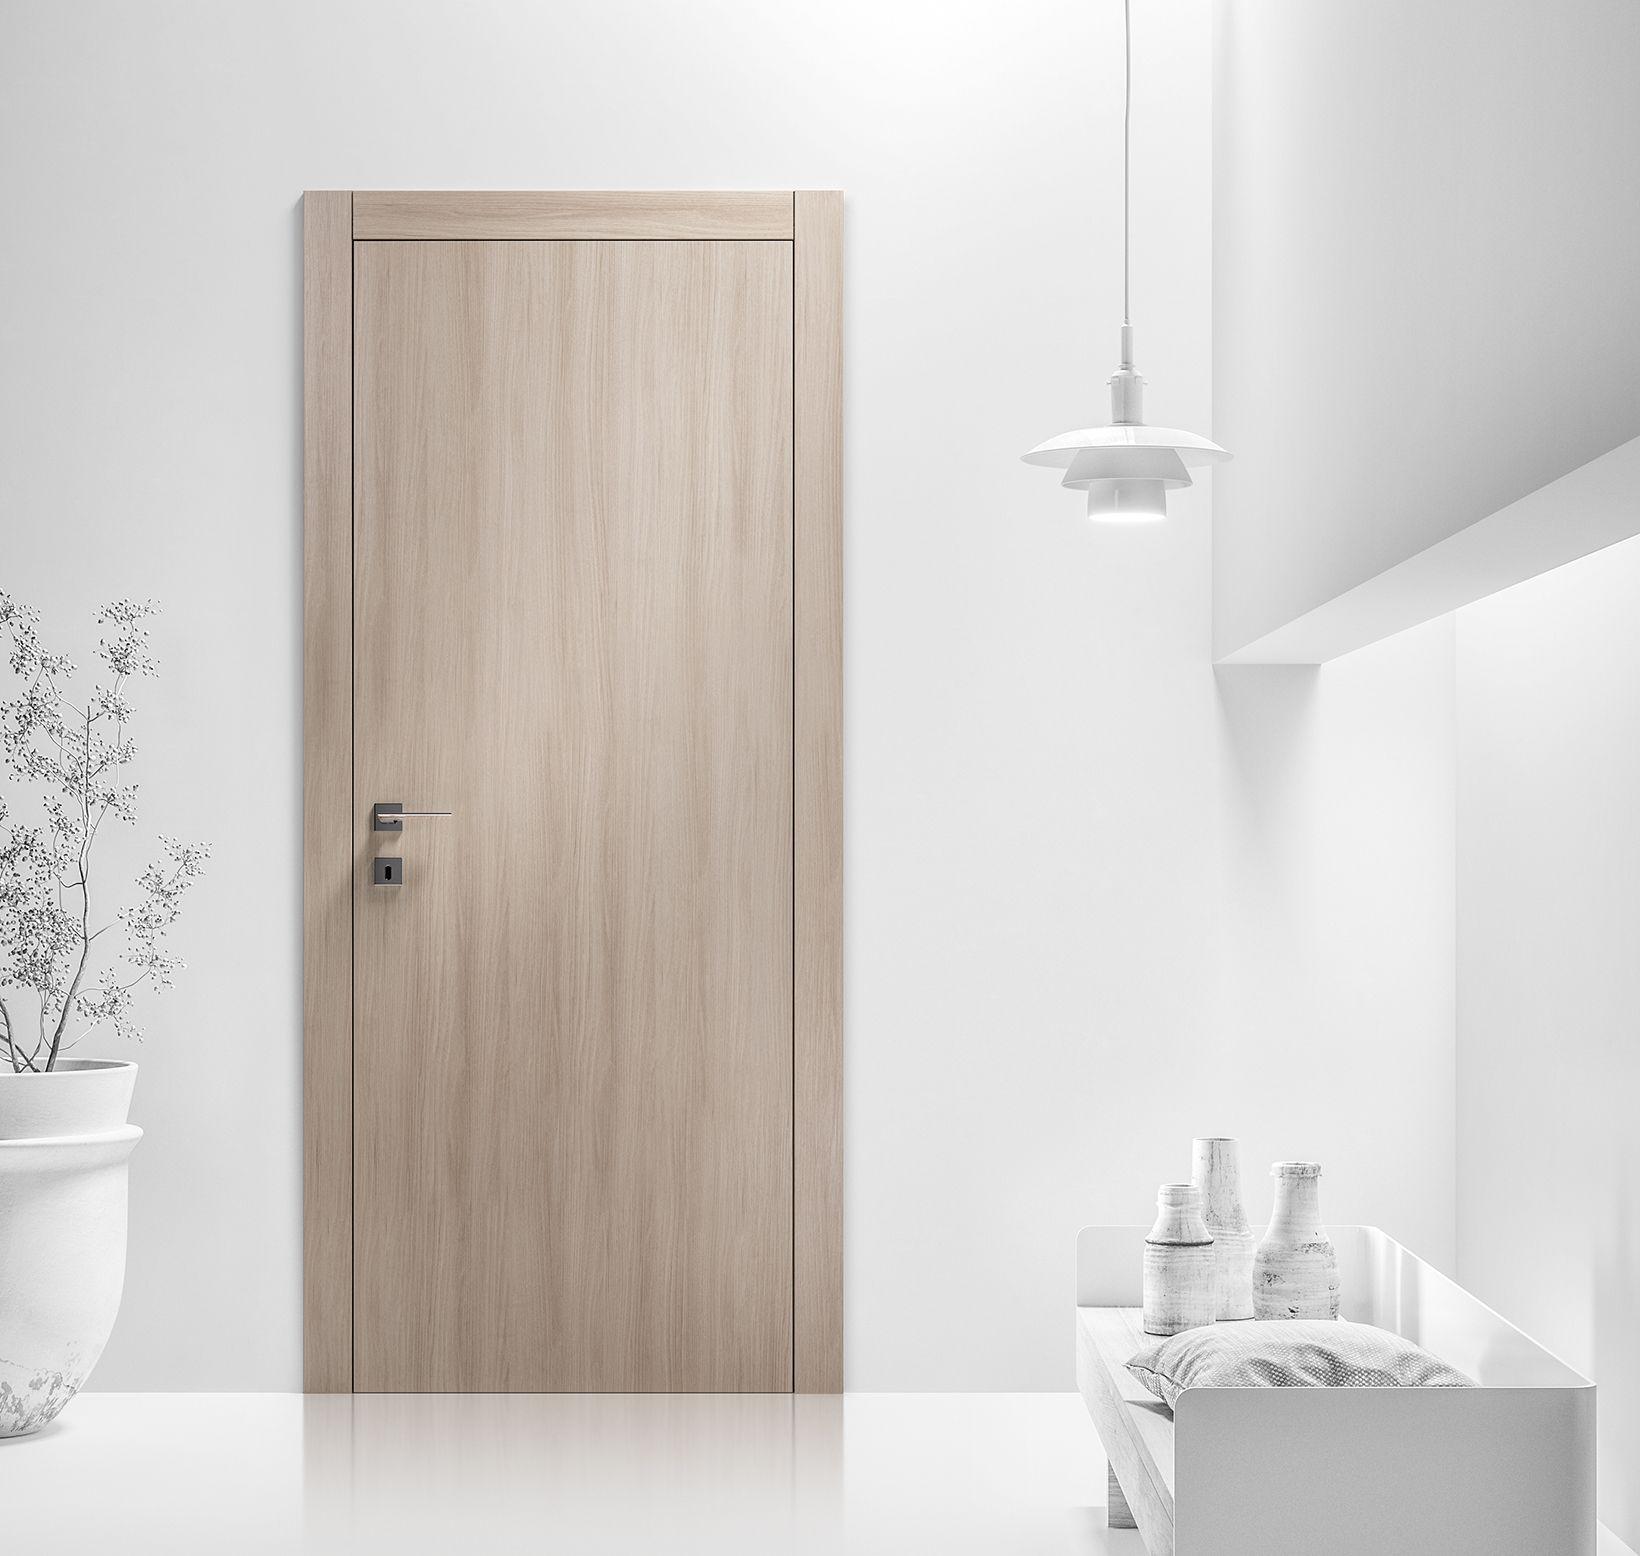 porta bathroom fittings. porta replica liss ontario cenere ferrerolegno bathroom fittings